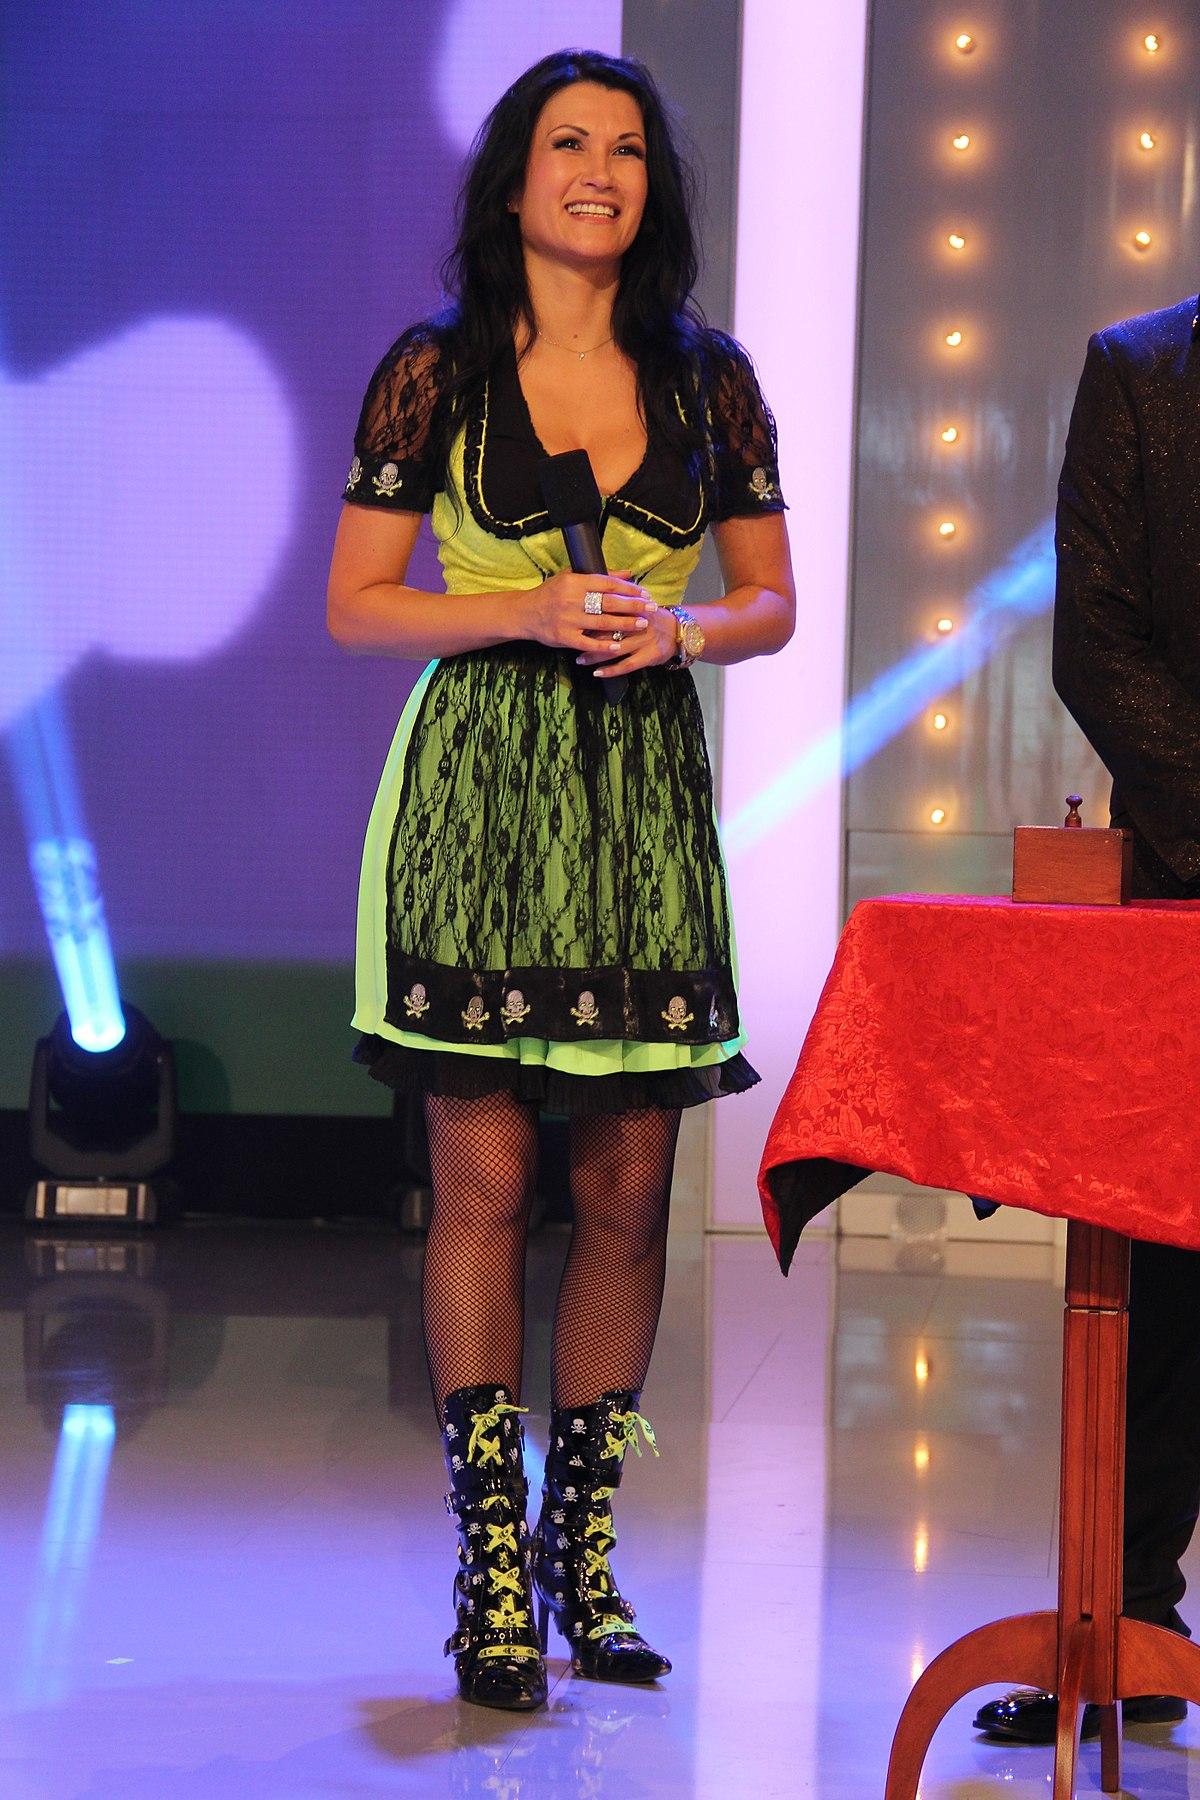 Antonia Aus Tirol Wohnort